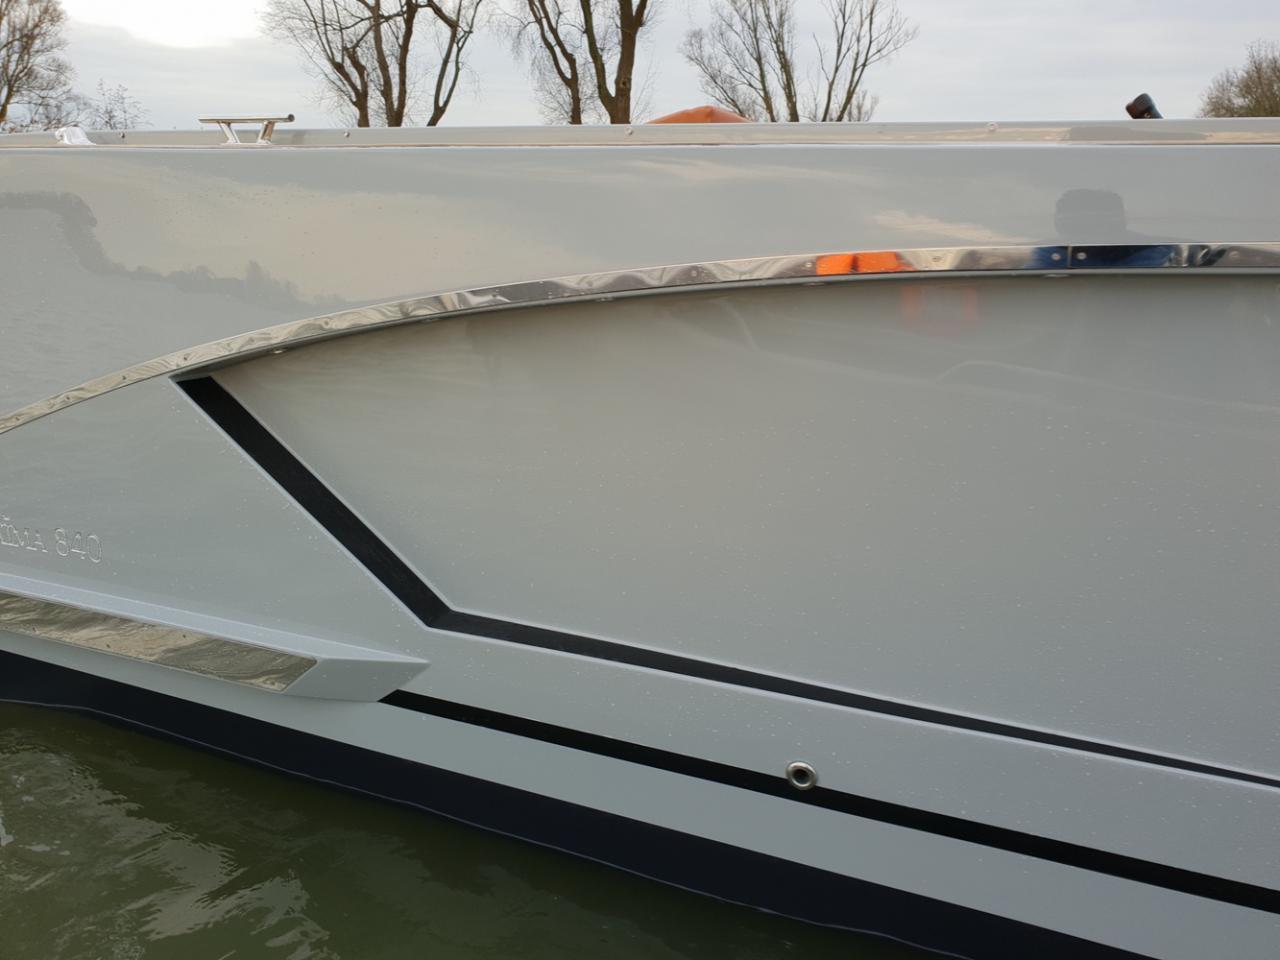 Maxima 840 tender 52